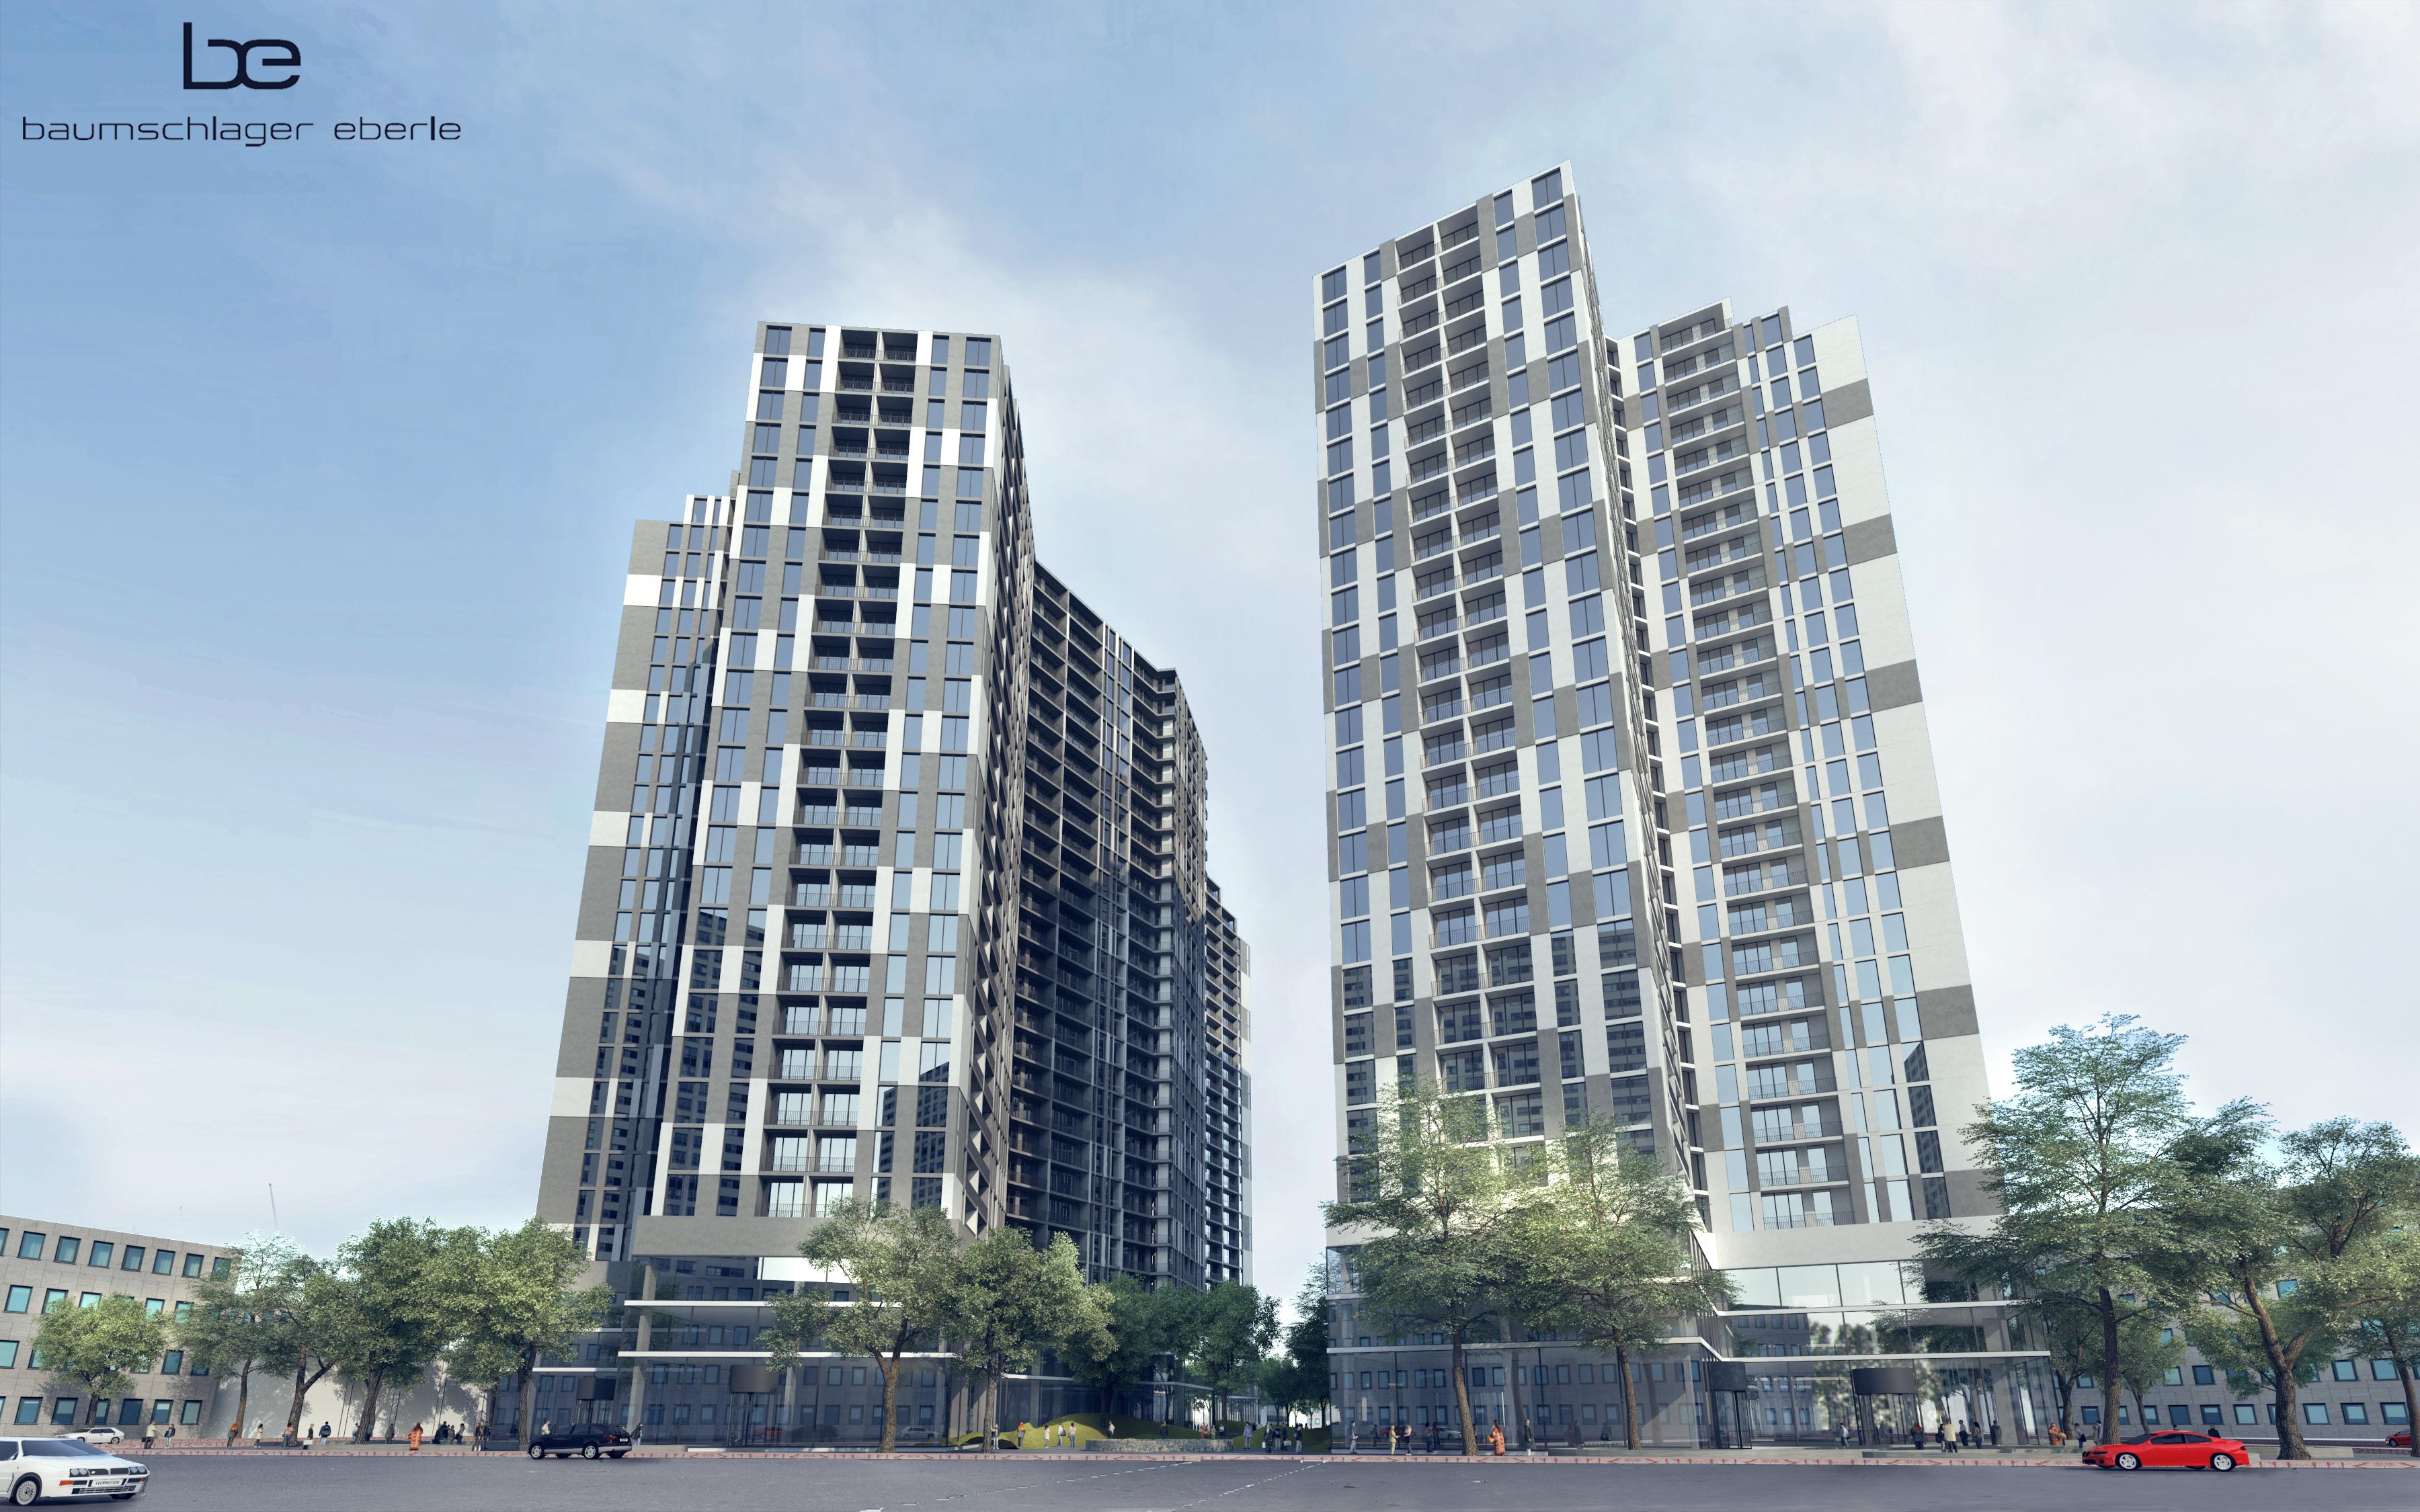 Tổ hợp chung cư ISG (Imperia Sky Garden) cao 27 tầng, 222.230 m2 sàn